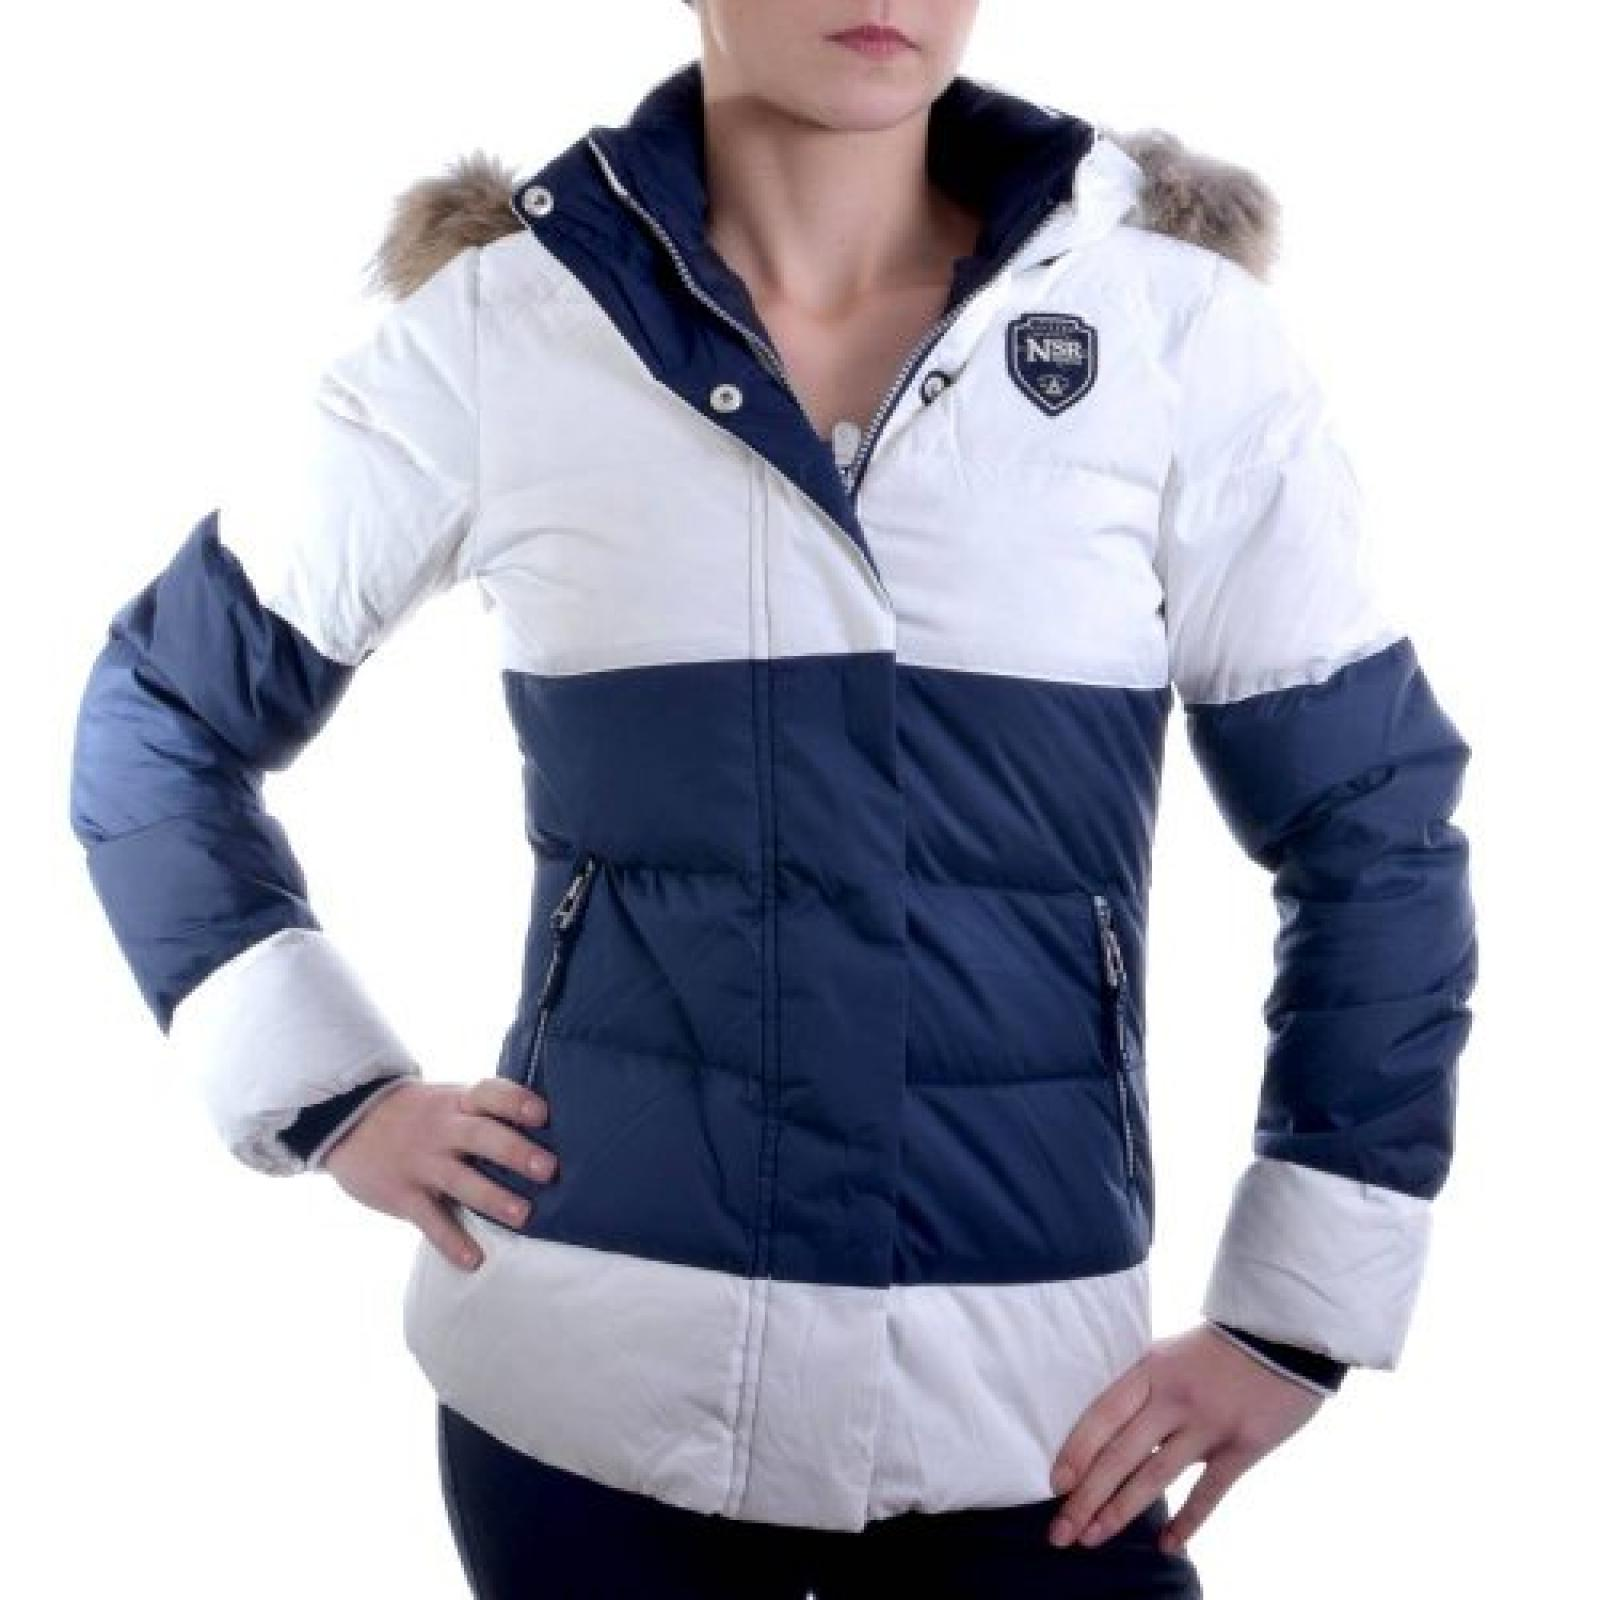 Gaastra Damenjacke Icestorm Gr. S UVP 339,95 Euro 36127032 Creme 338 Damen Jacke